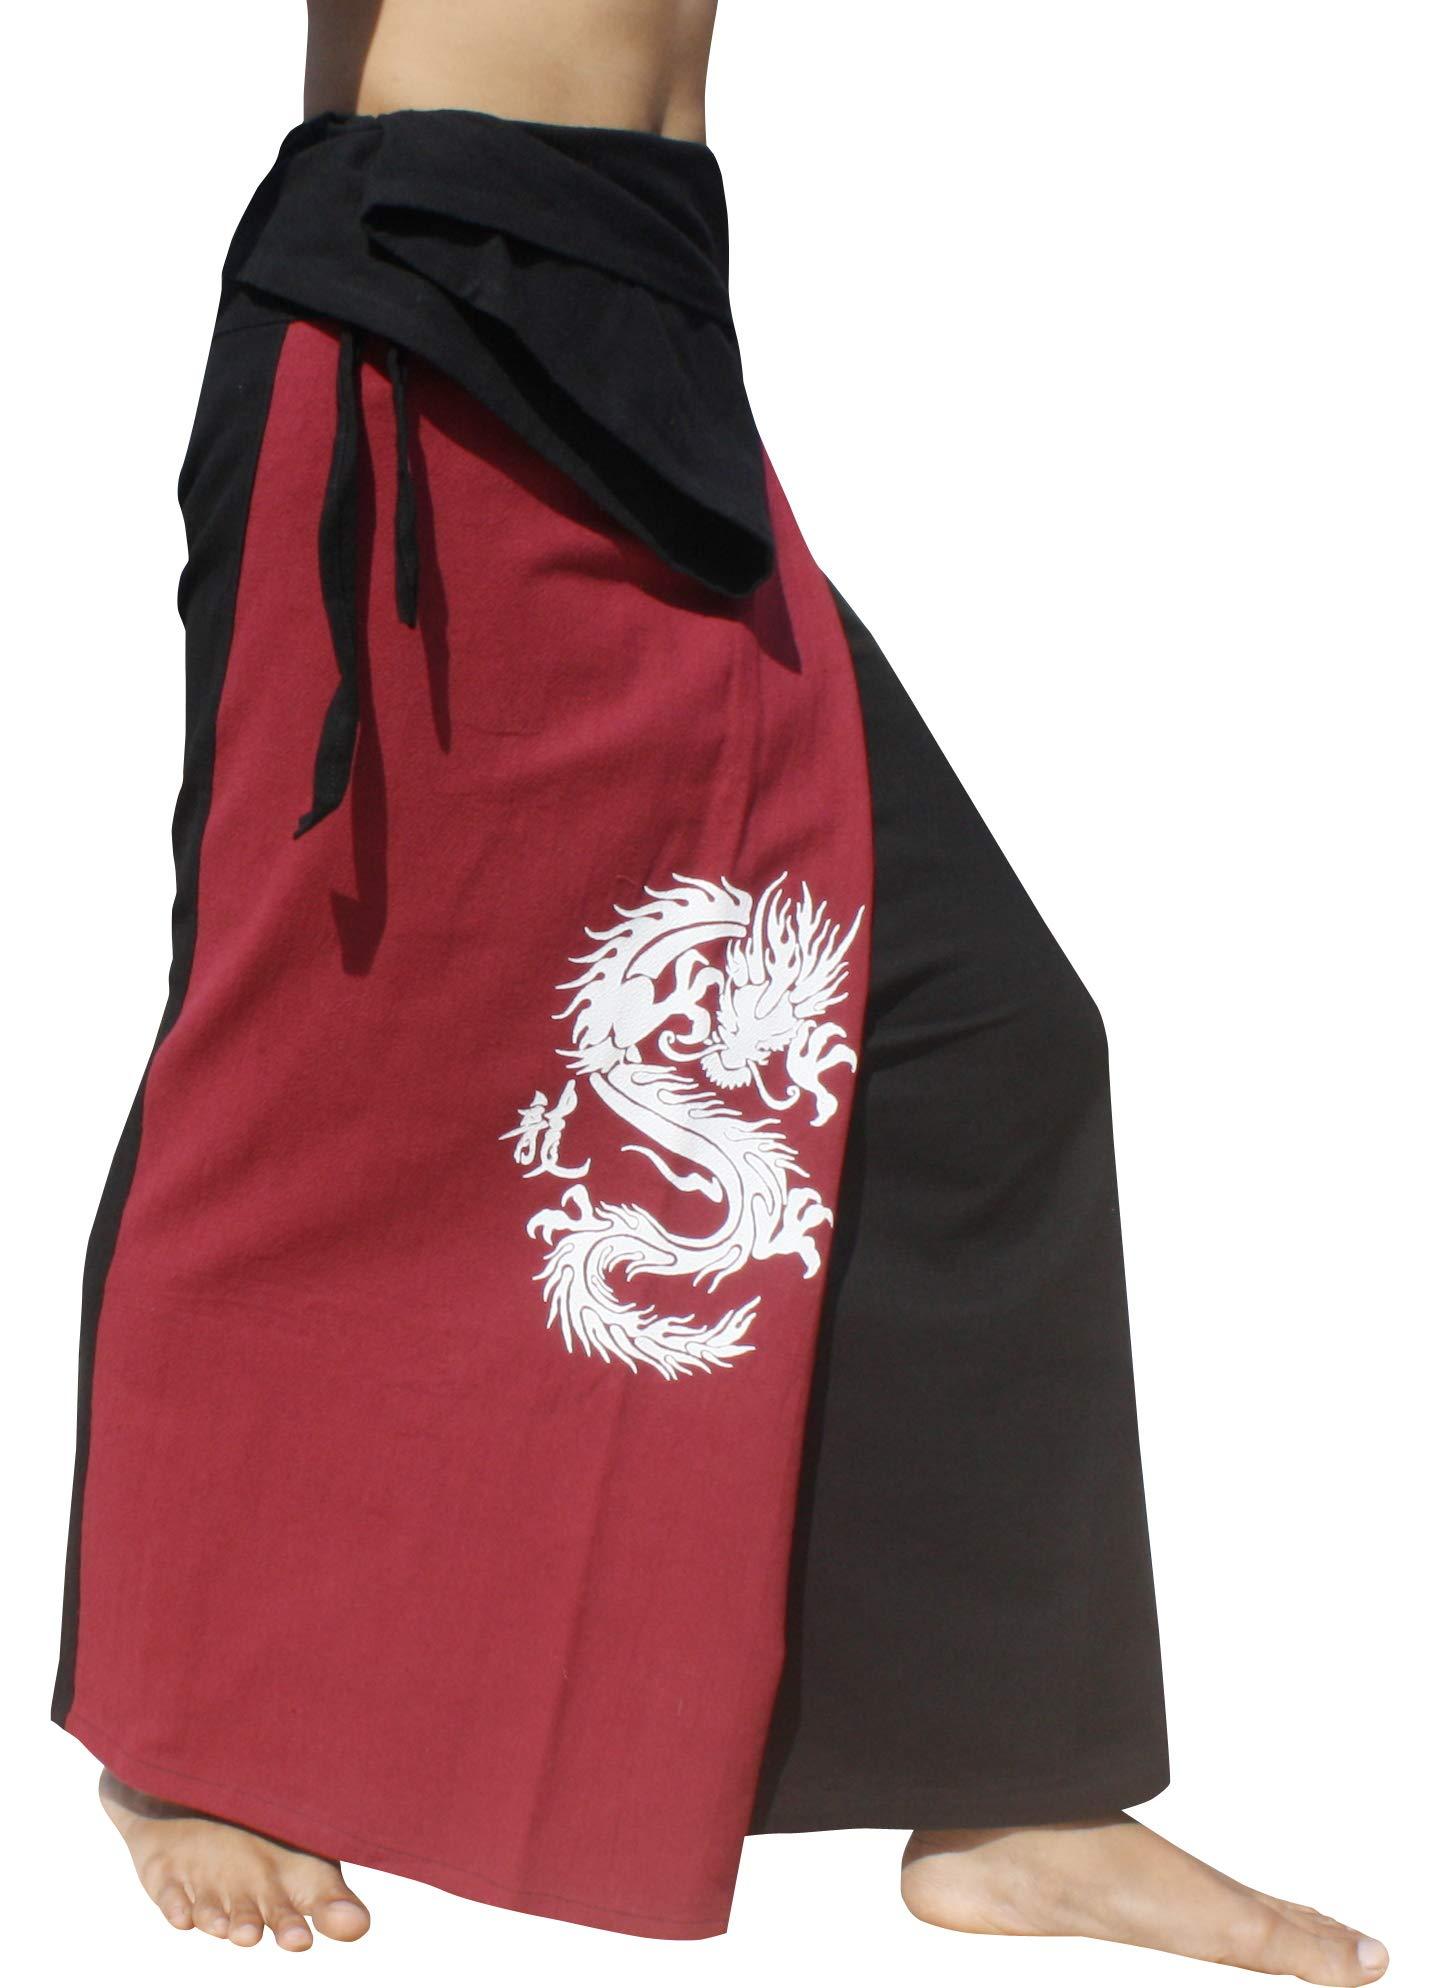 Raan Pah Muang Thick Cotton Two Color Fire Dragon Samurai Wrap Pants, X-Large, Dark Red & Black by Raan Pah Muang